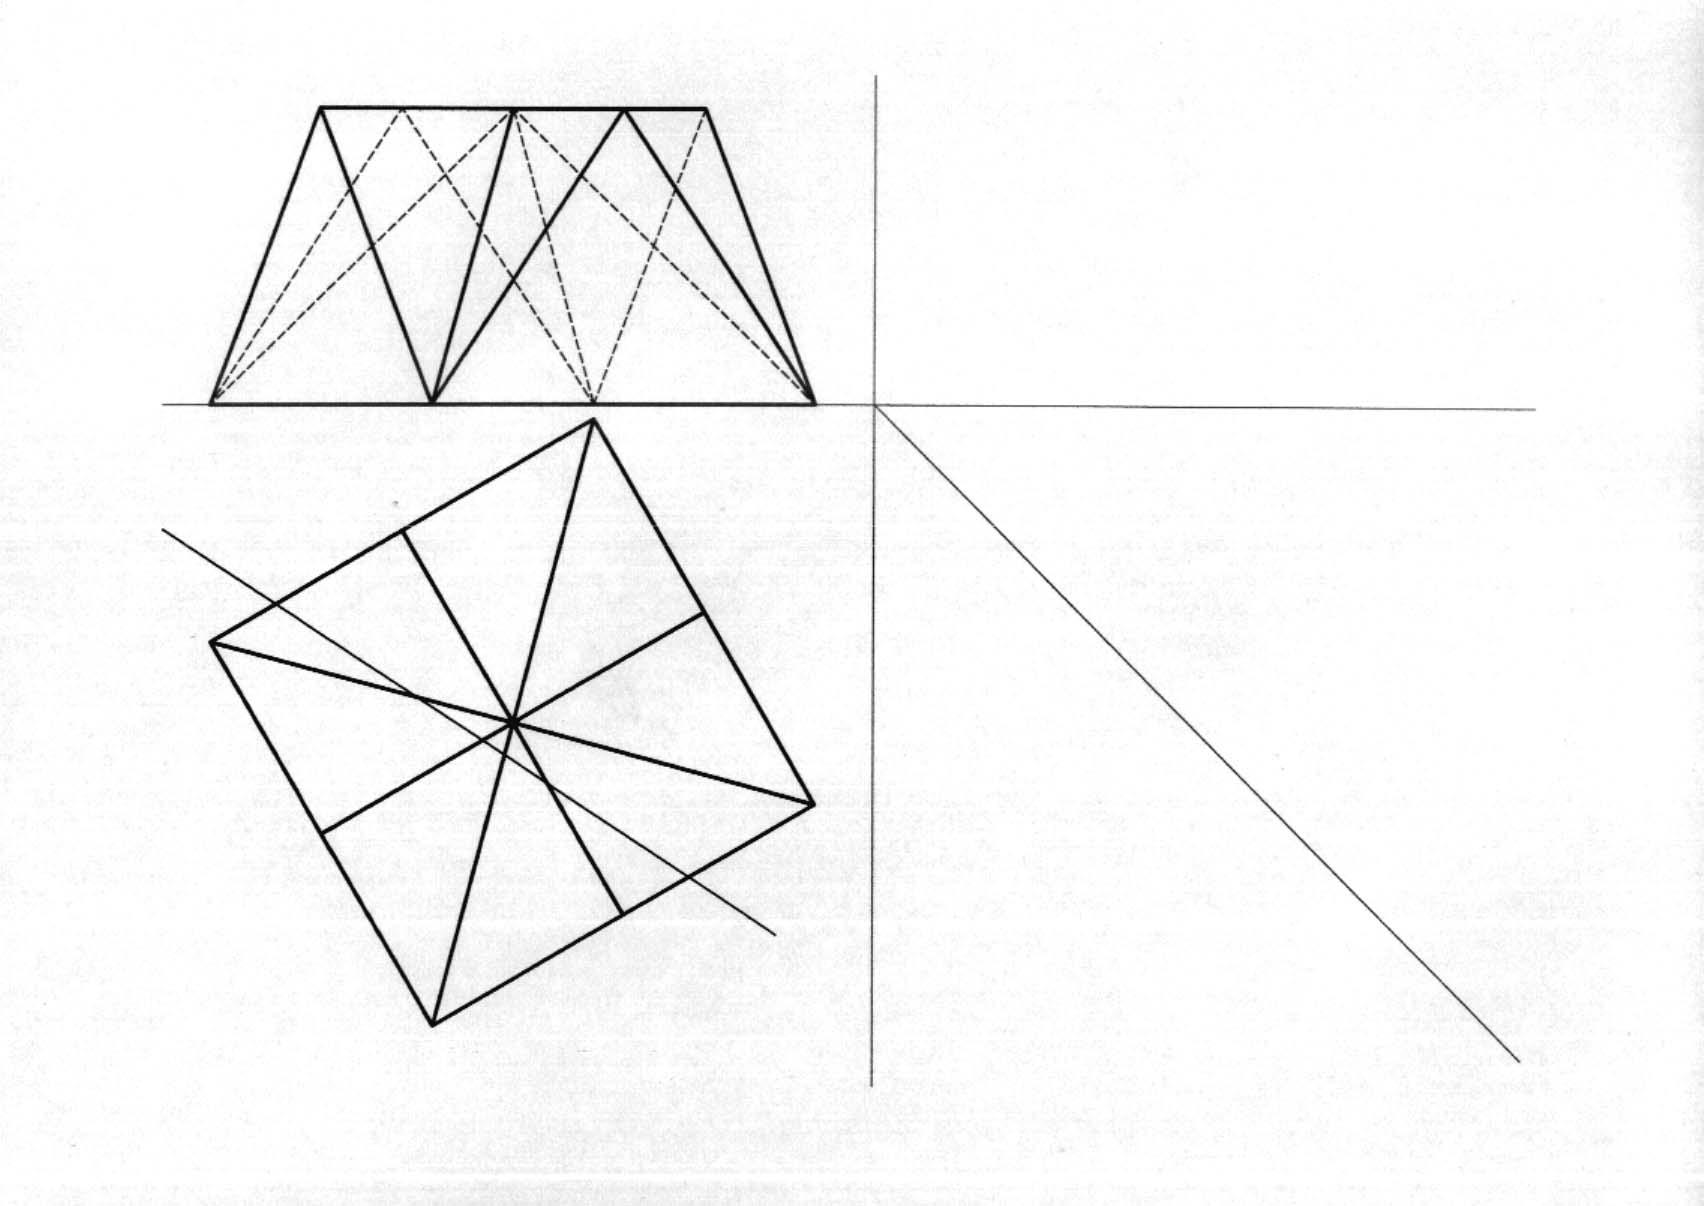 . Isometric Drawing